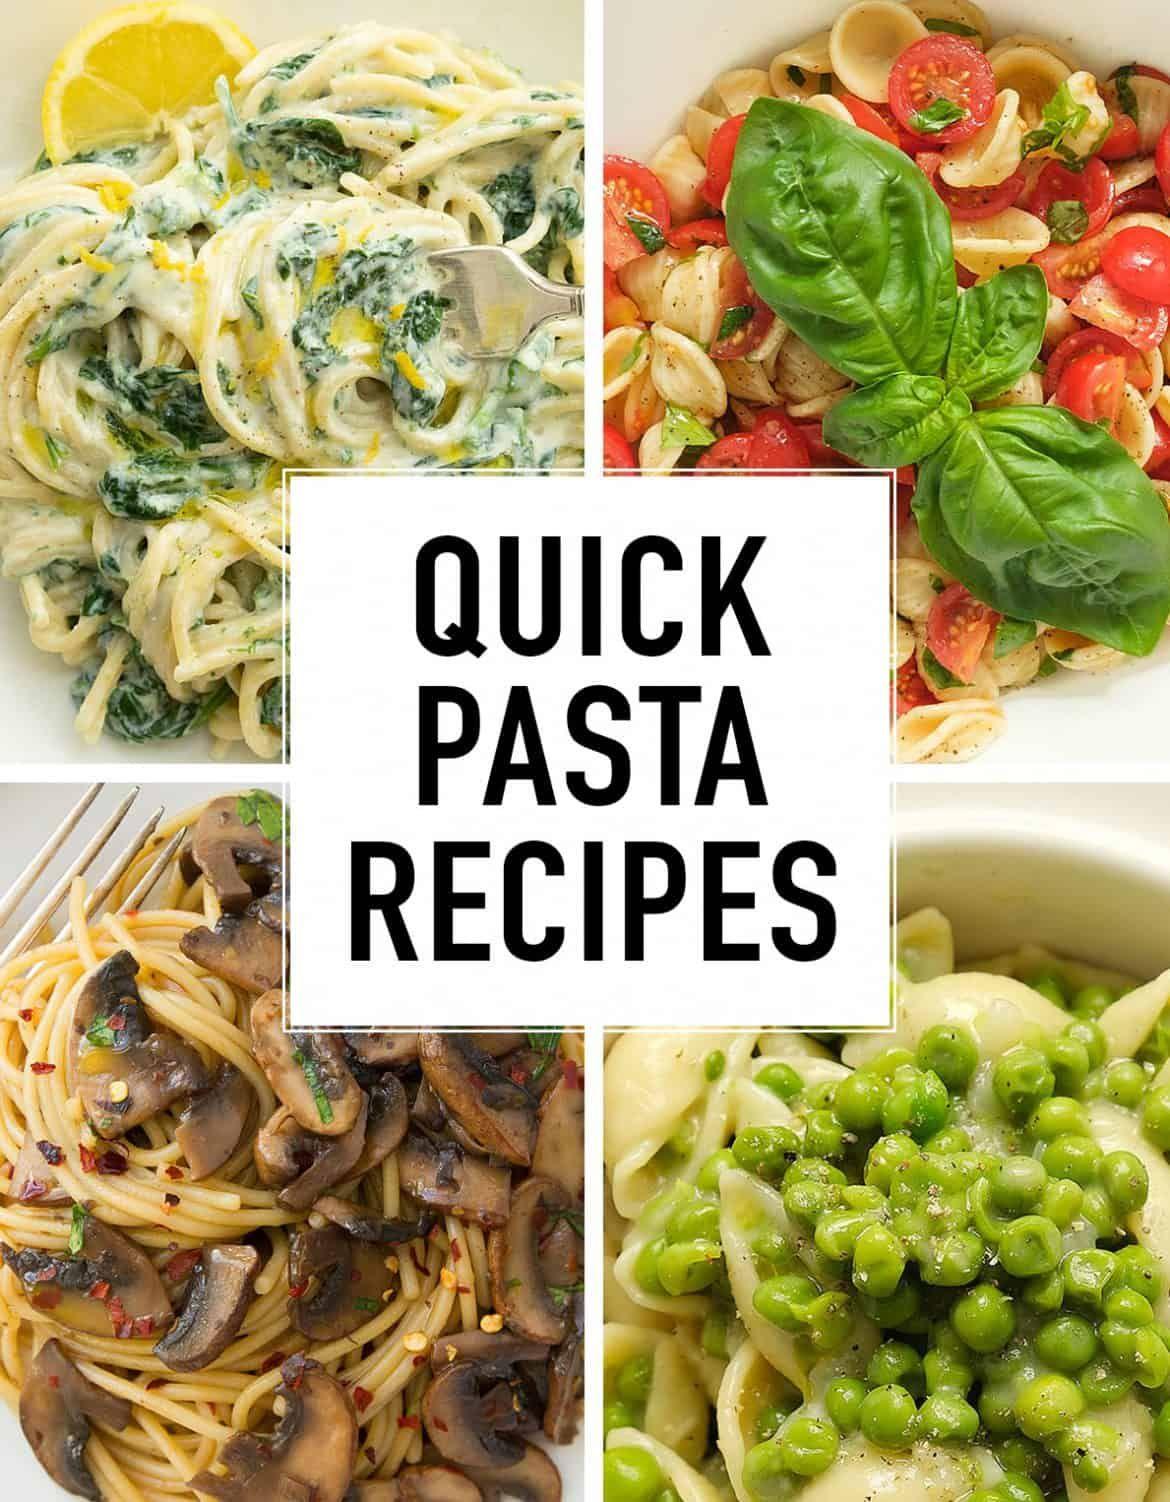 13 Super Quick Pasta Recipes Quick Pasta Recipes Pasta Recipes Quick Pasta